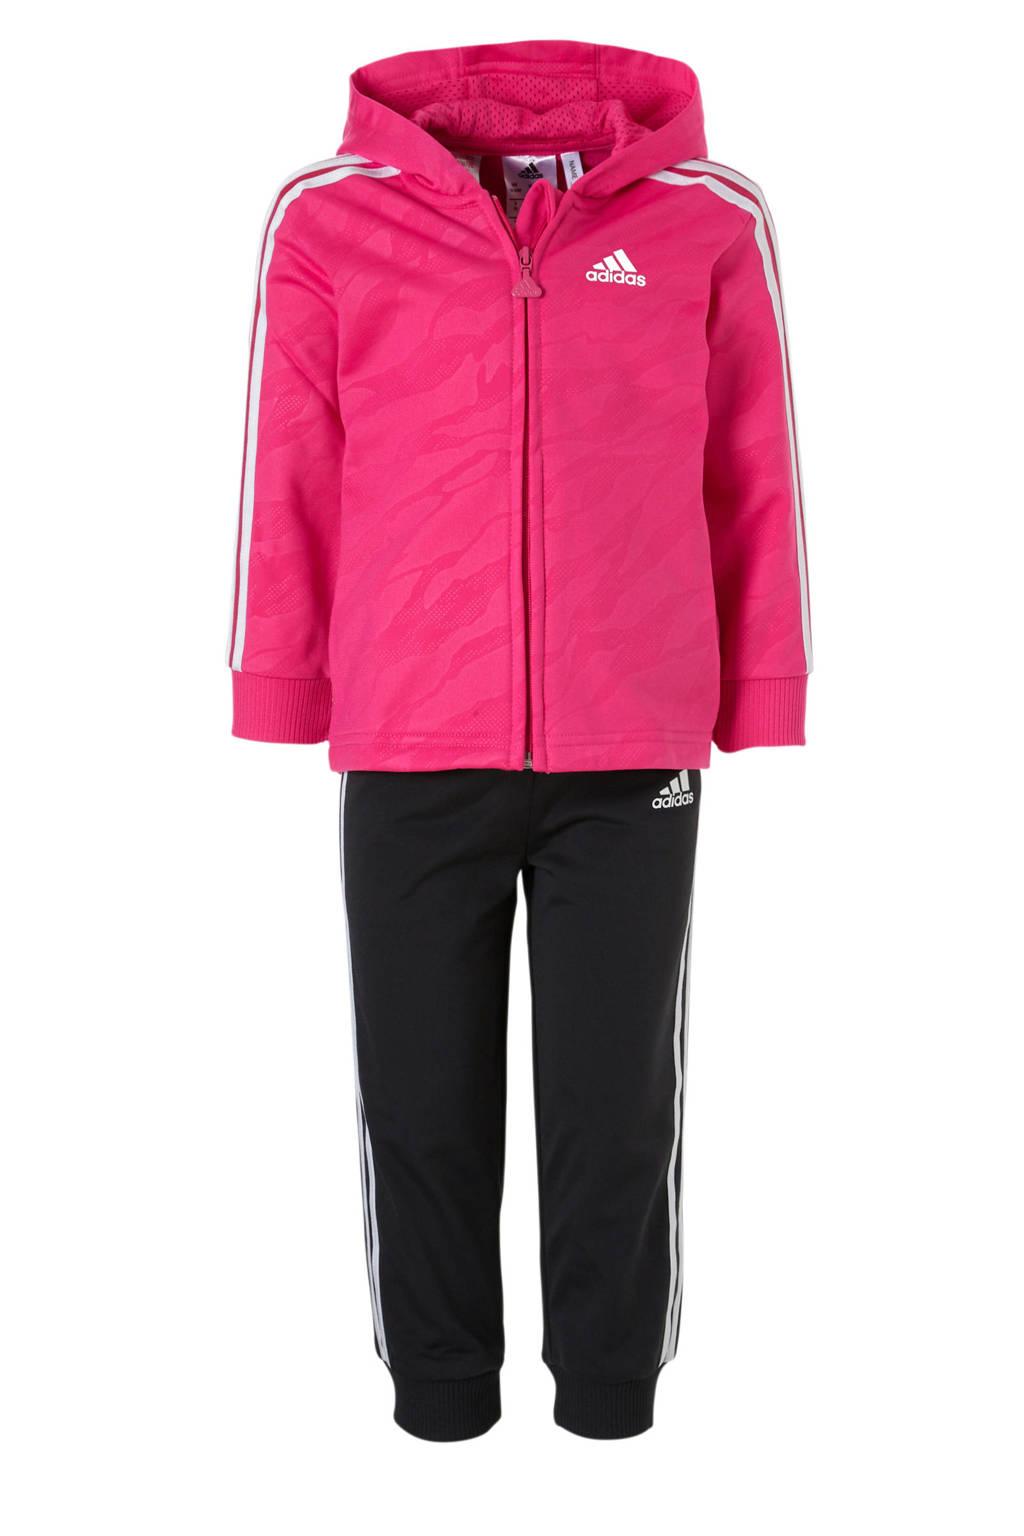 adidas performance trainingspak roze, Roze